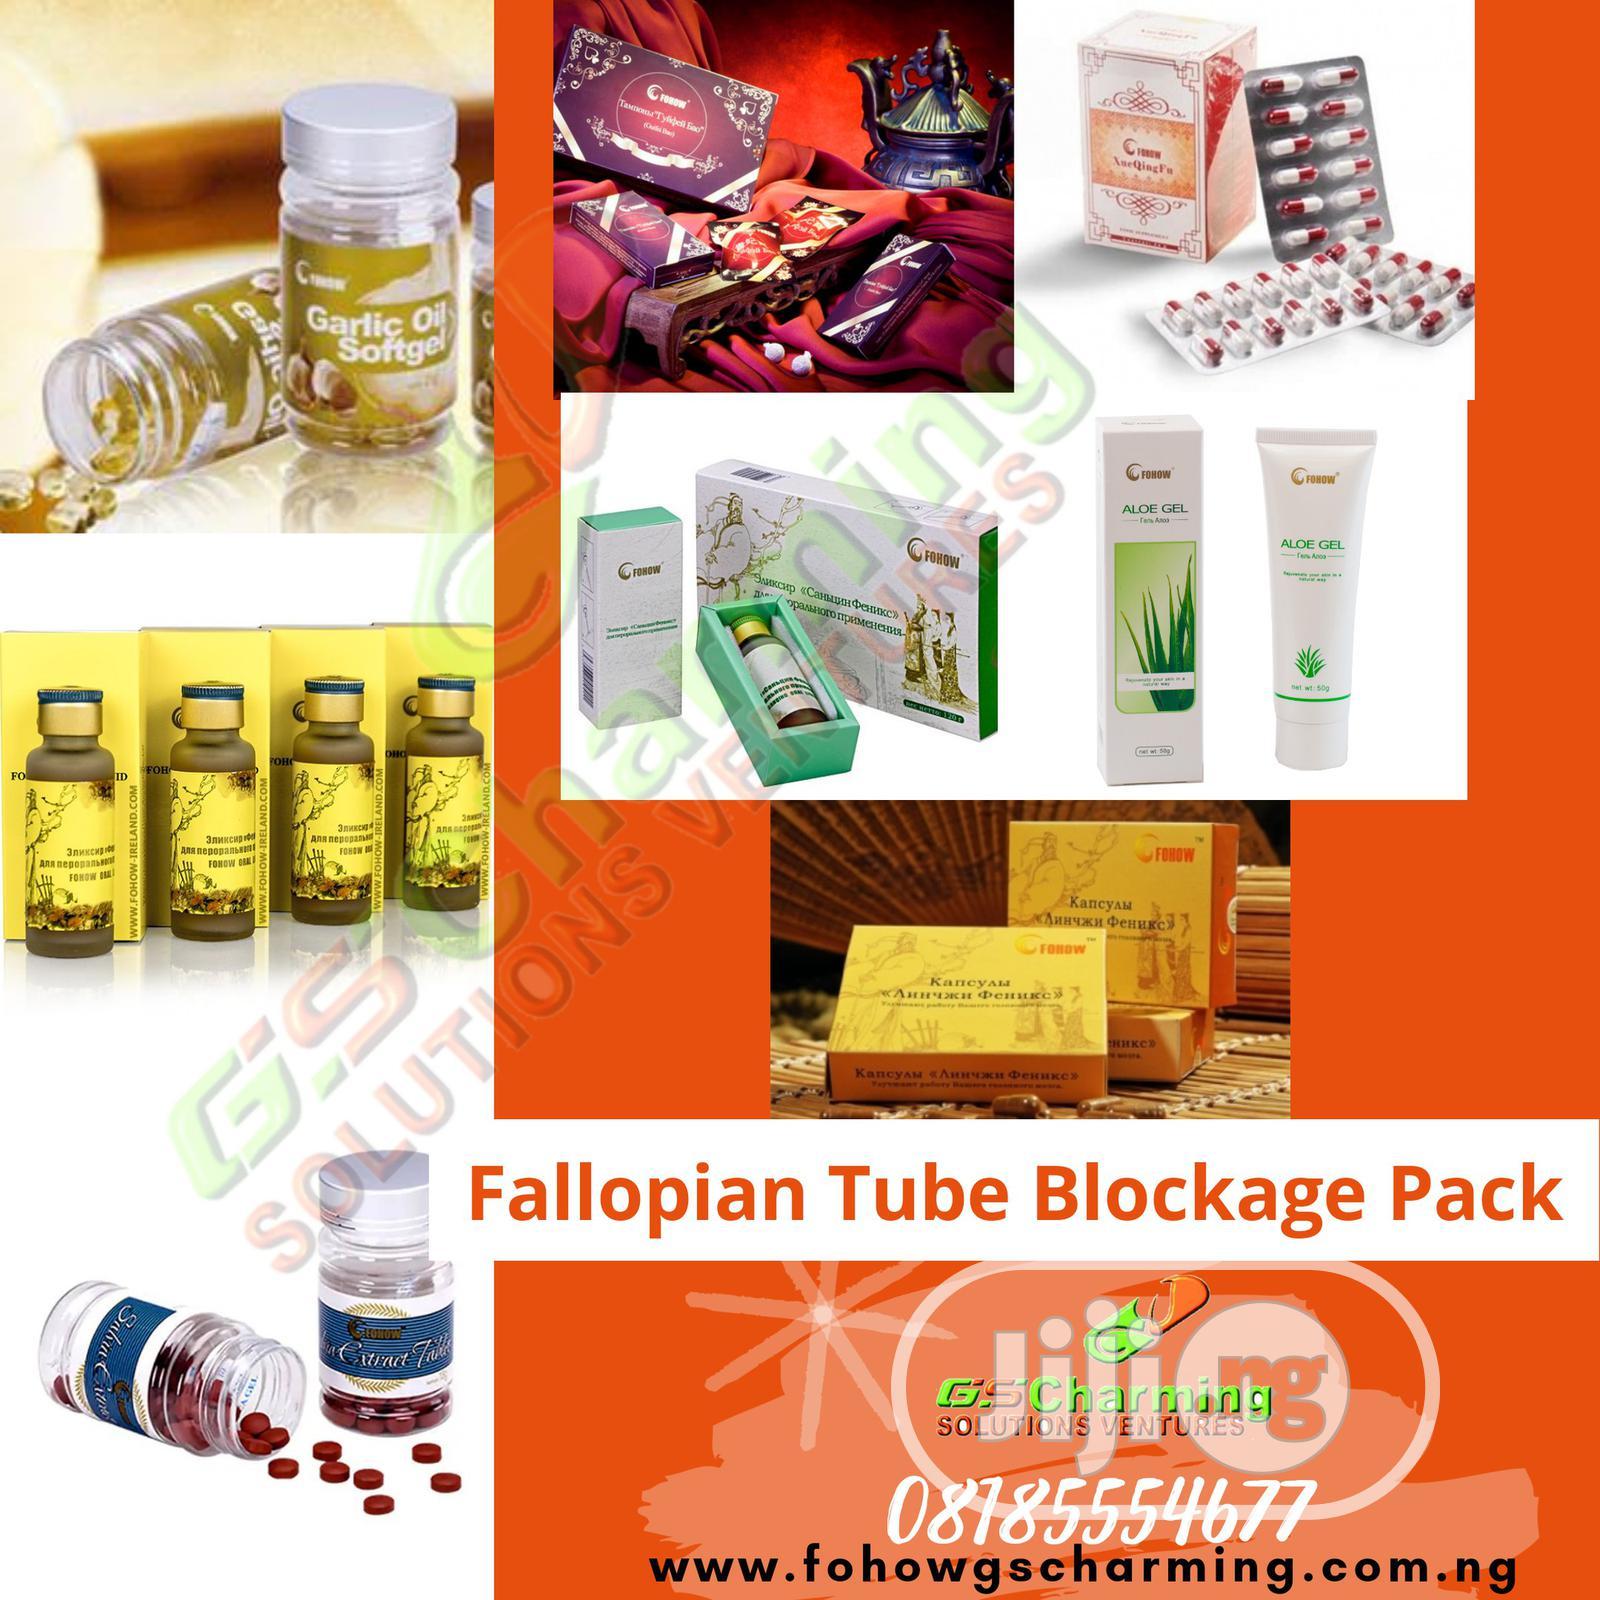 Fallopian Tube Blockage Solution Pack